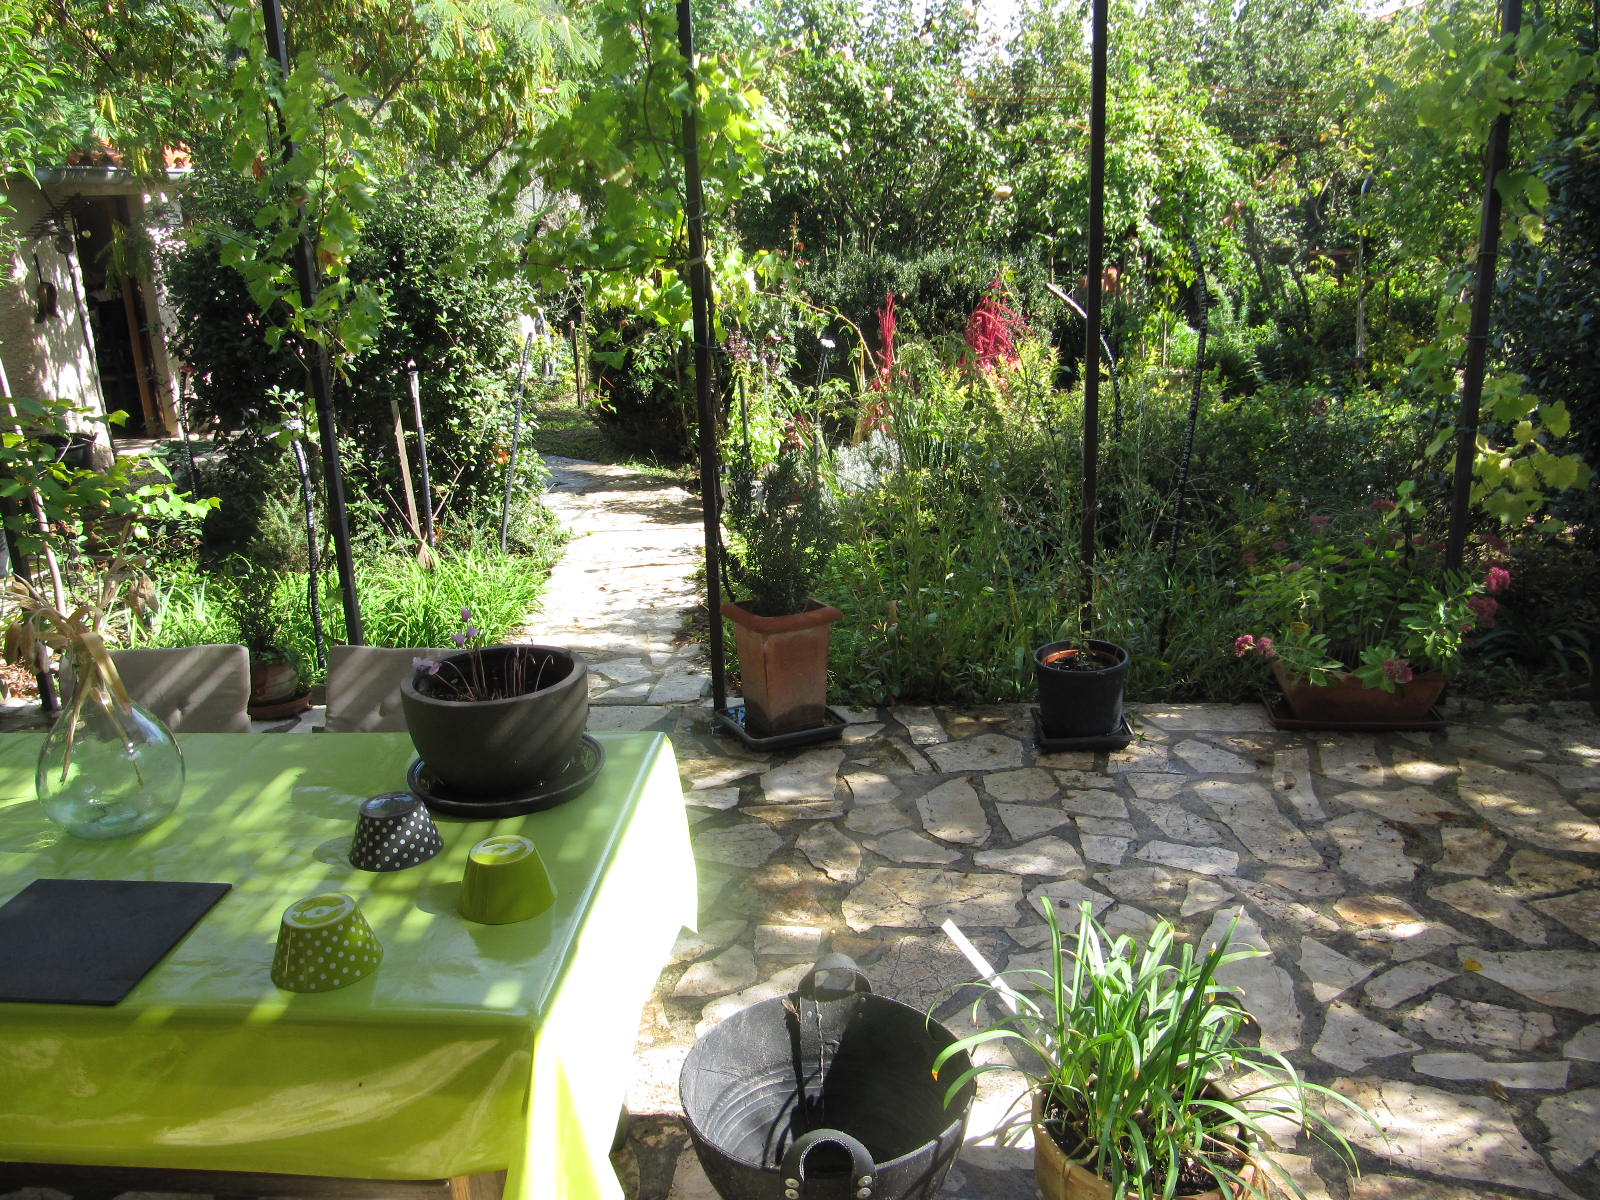 la-terrasse-donne-sur-un-jardin-informel-20151207-1129031745a44adaa3-0011-edd4-3712-d4e1300682e482885AB0-5ED6-EE81-2E61-EDD0B531A637.jpg